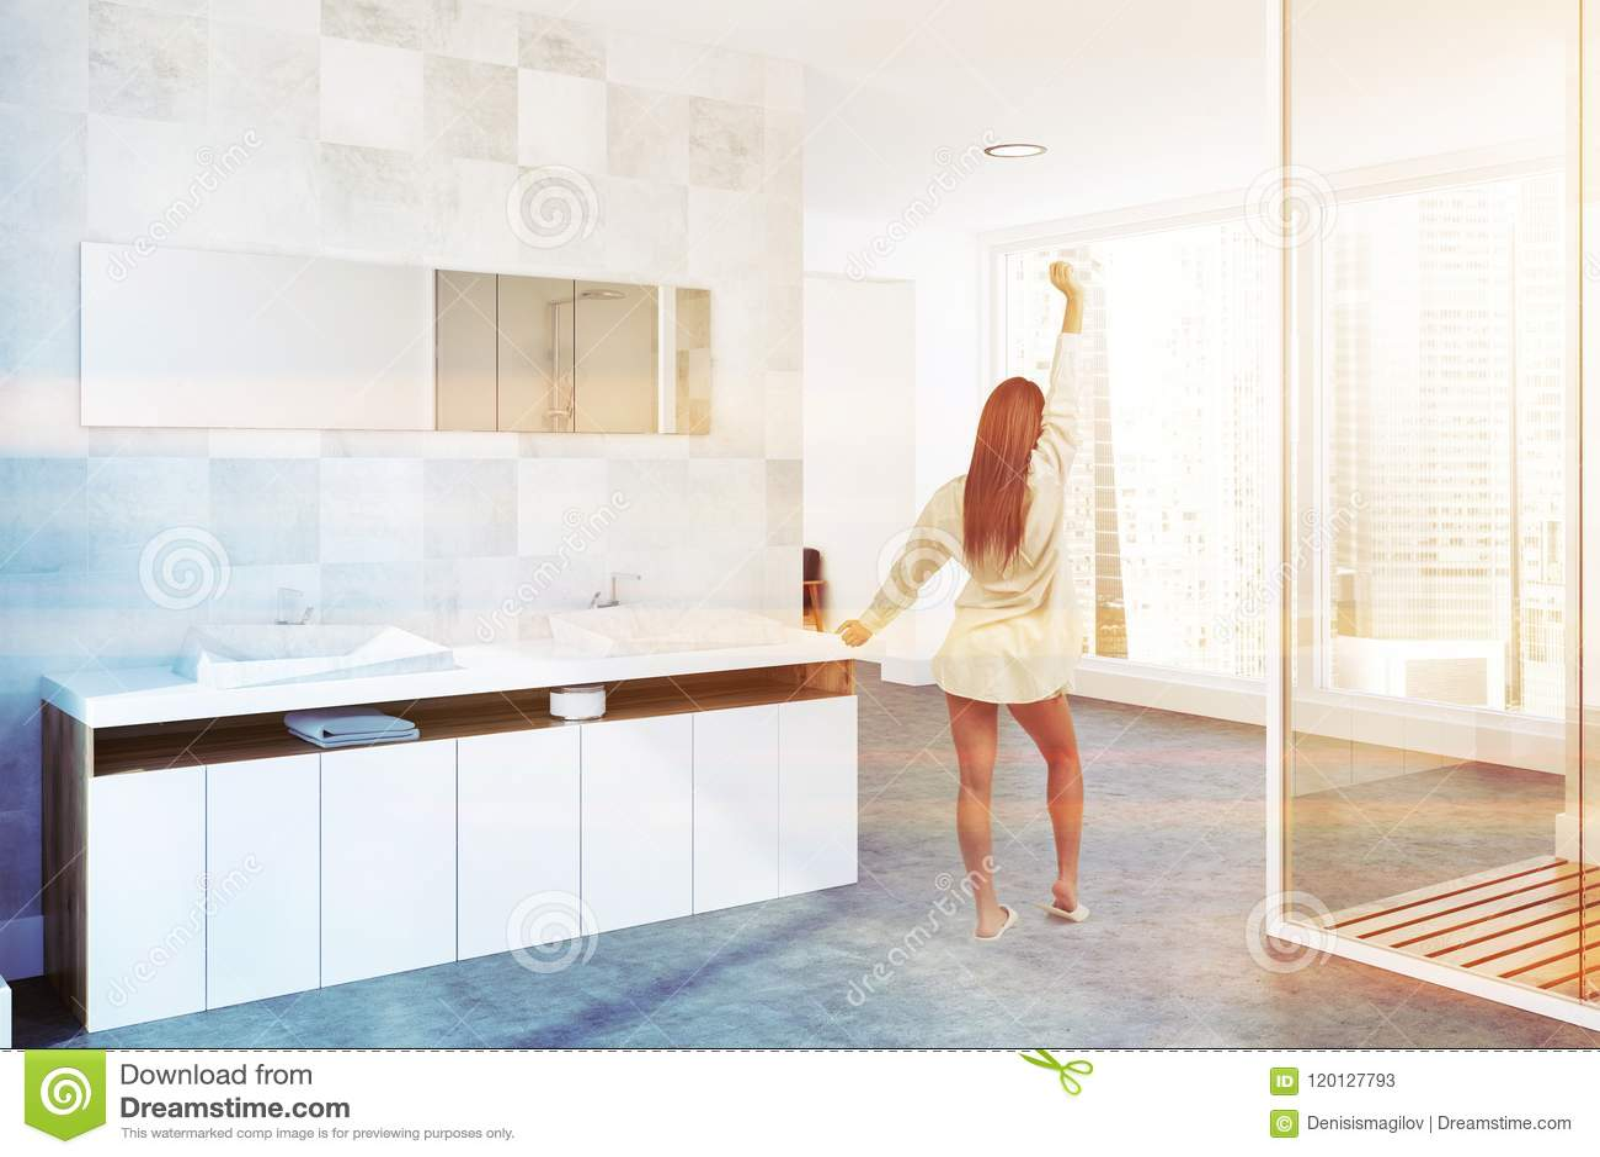 White Twin Luxury Bathroom Sink, Side View, Woman Stock Illustration ...